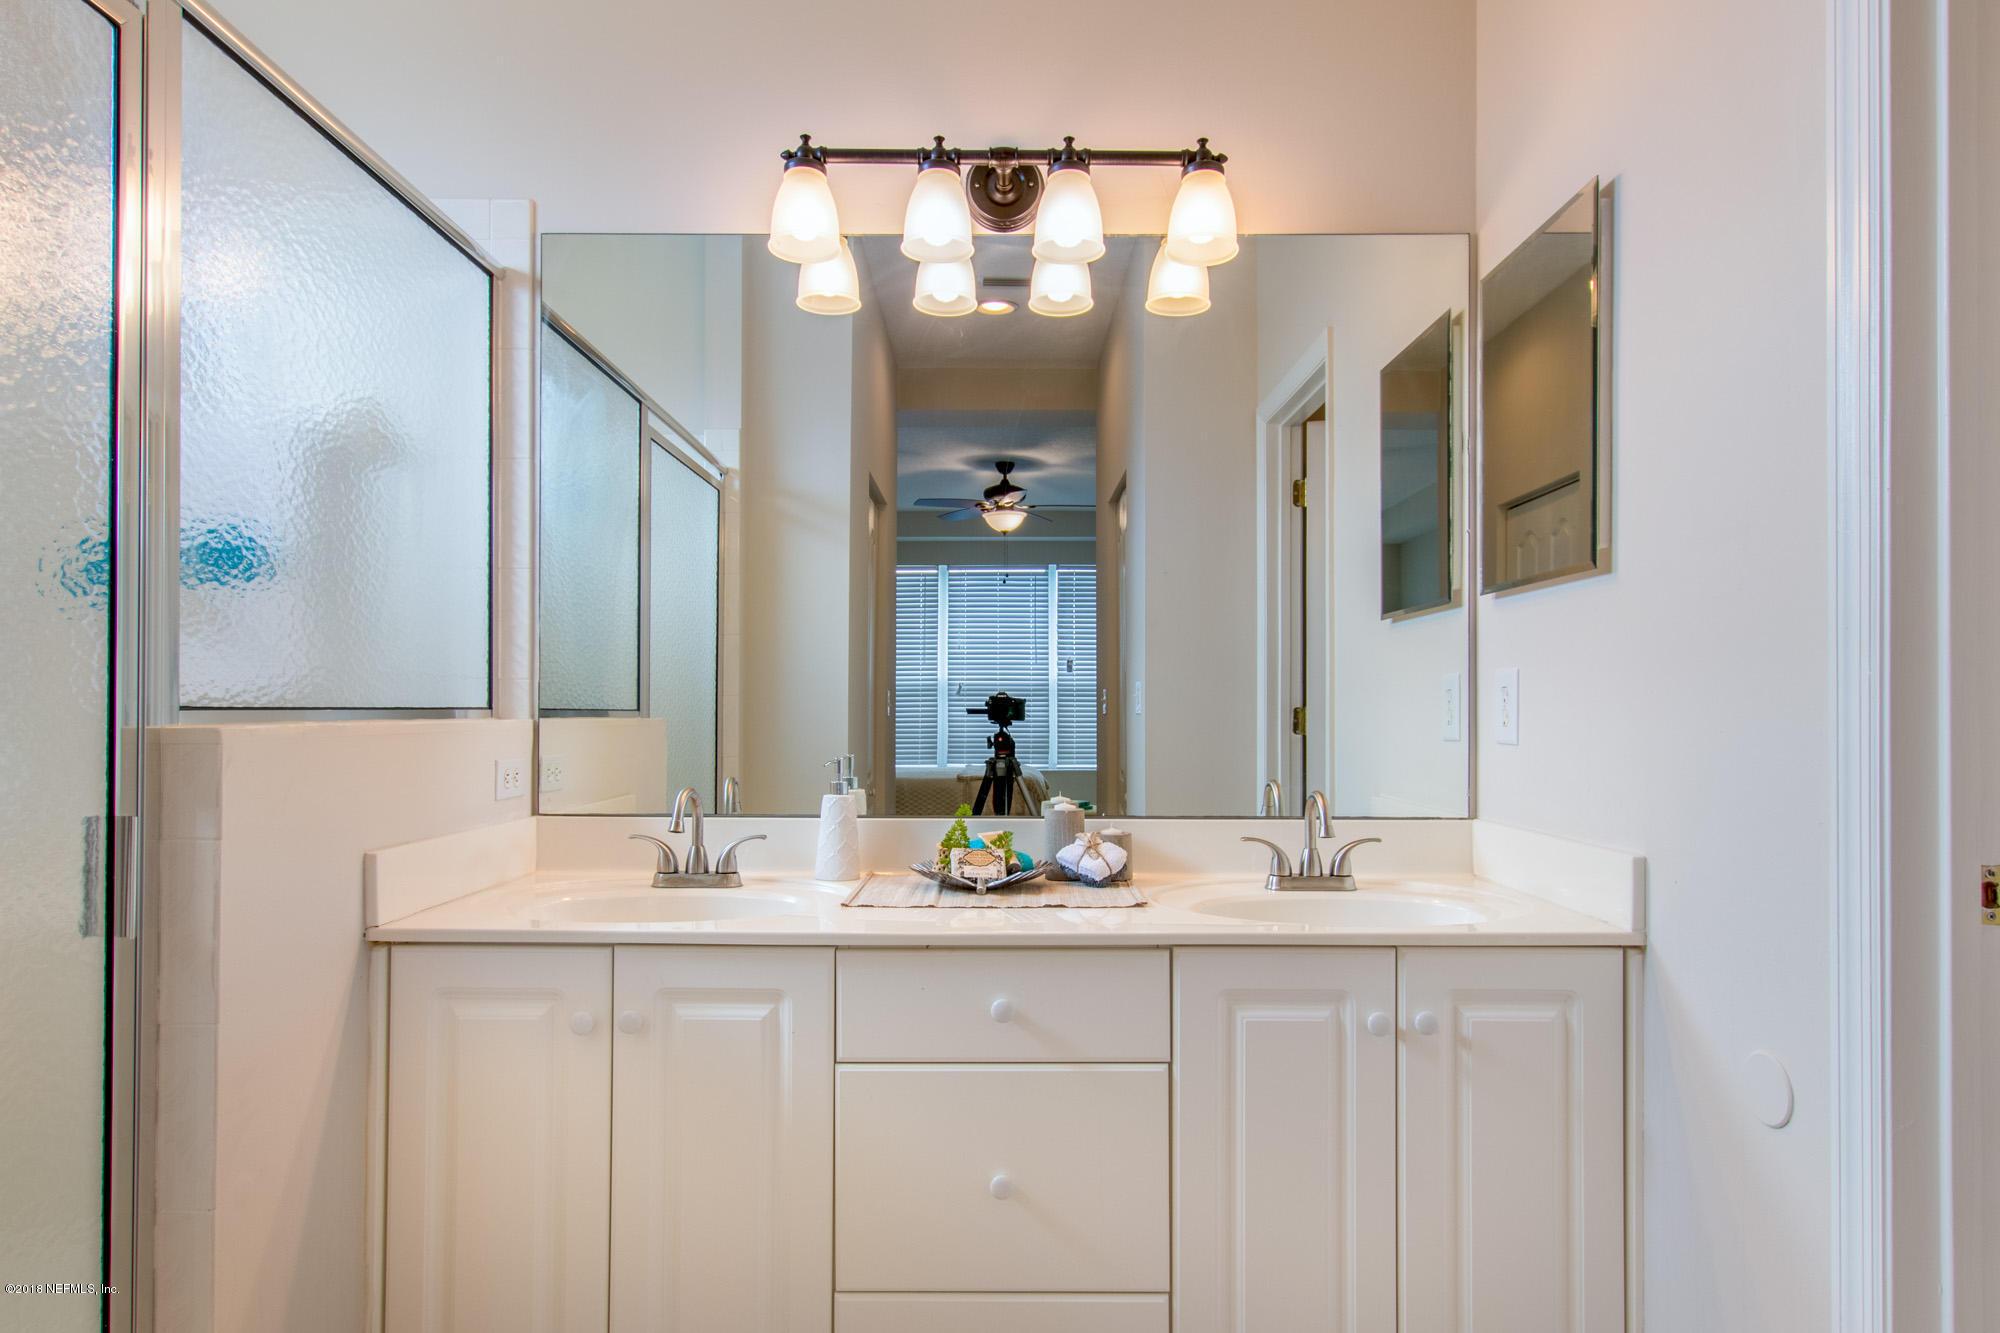 216 SAN NICOLAS, ST AUGUSTINE, FLORIDA 32080, 3 Bedrooms Bedrooms, ,2 BathroomsBathrooms,Residential - single family,For sale,SAN NICOLAS,952644